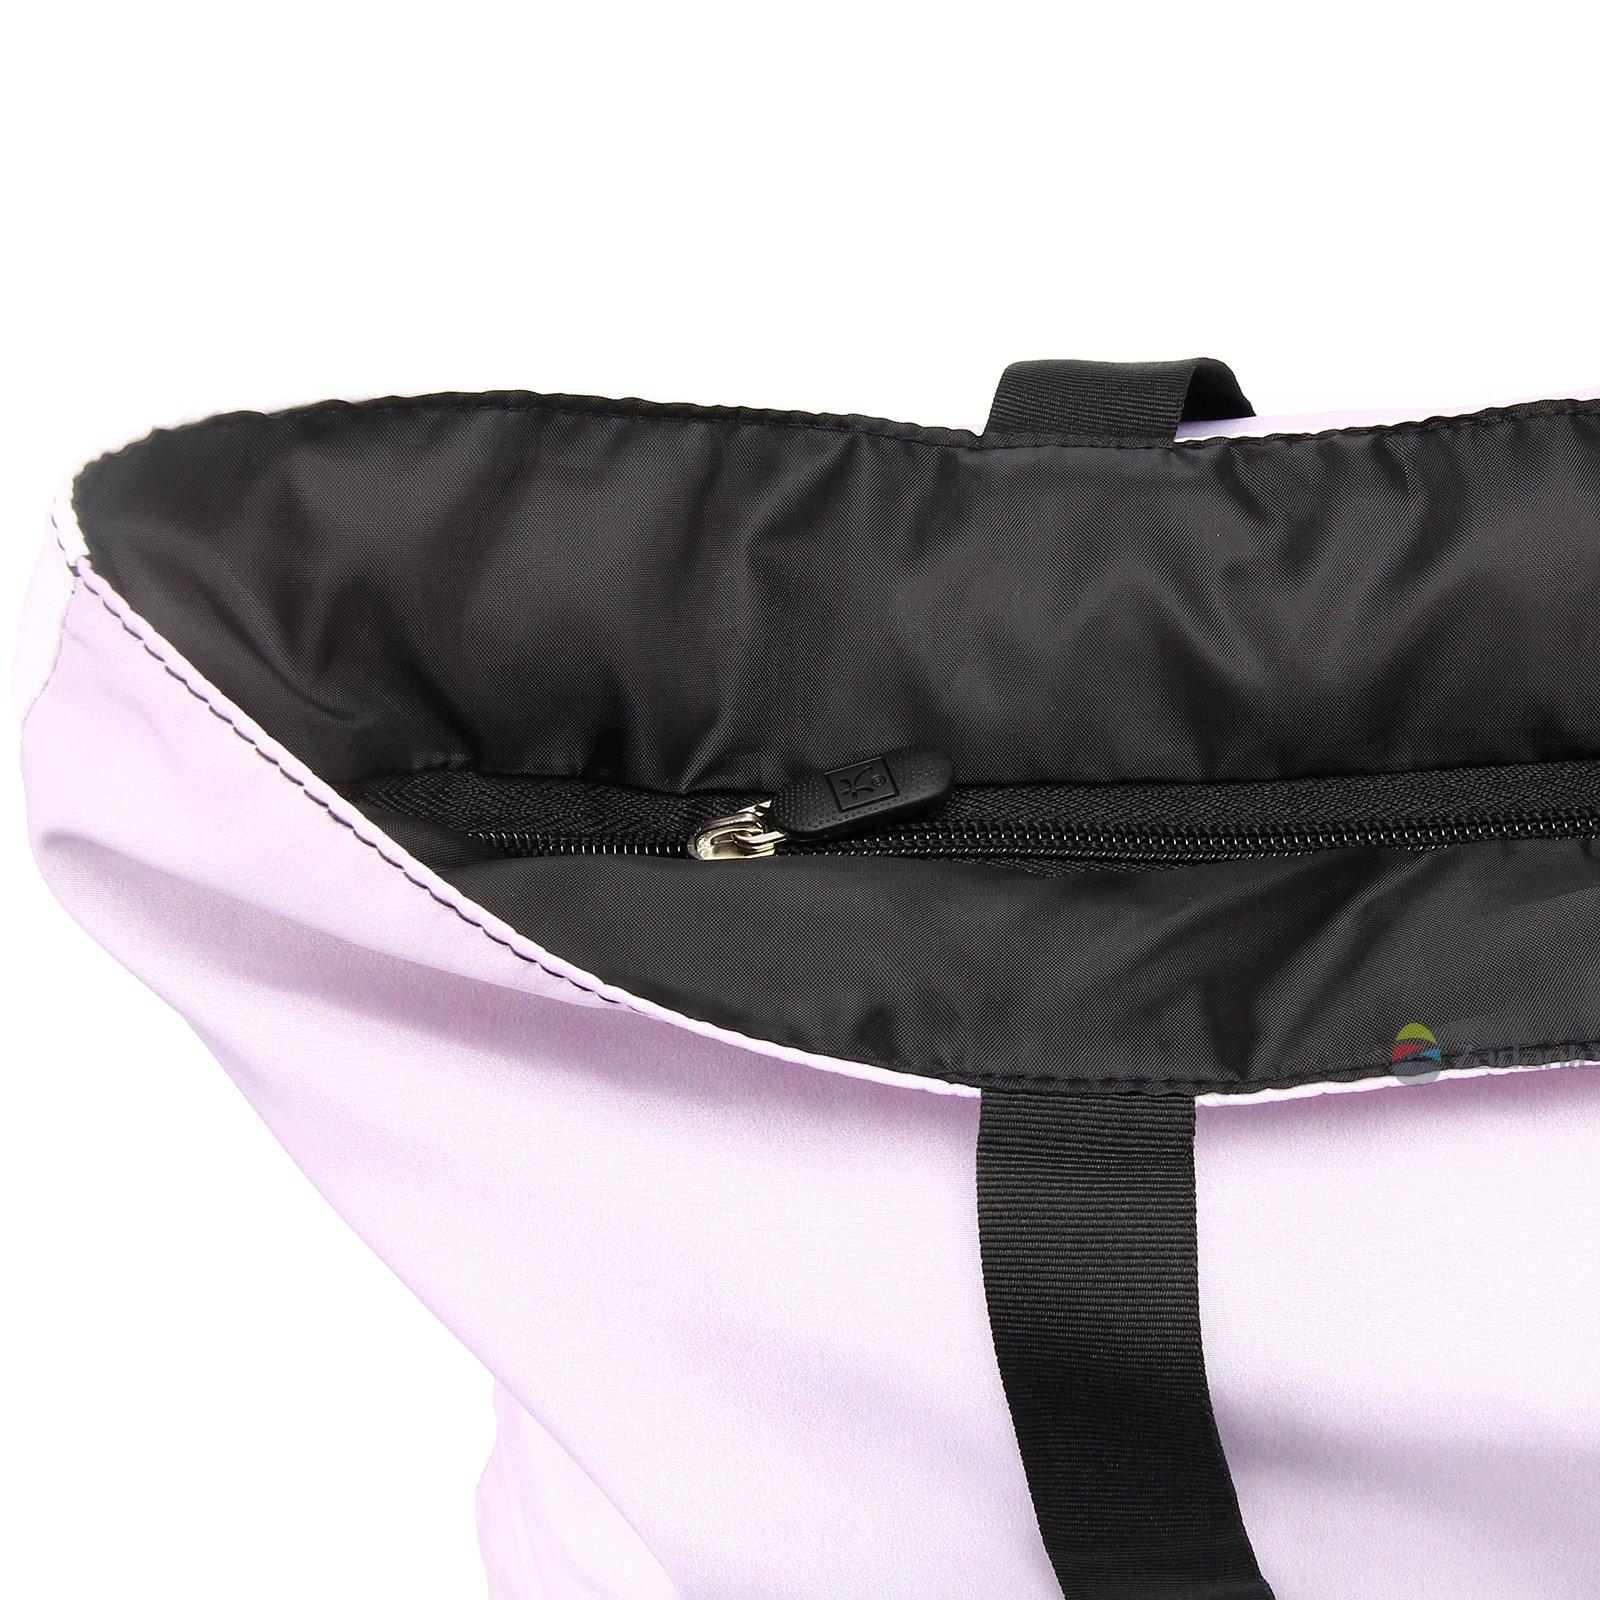 Newplenty Ladies Zippered Light Shoulder Shopping Tote Bag Handbag Beach Satchel (SB-6006) by newplenty (Image #7)